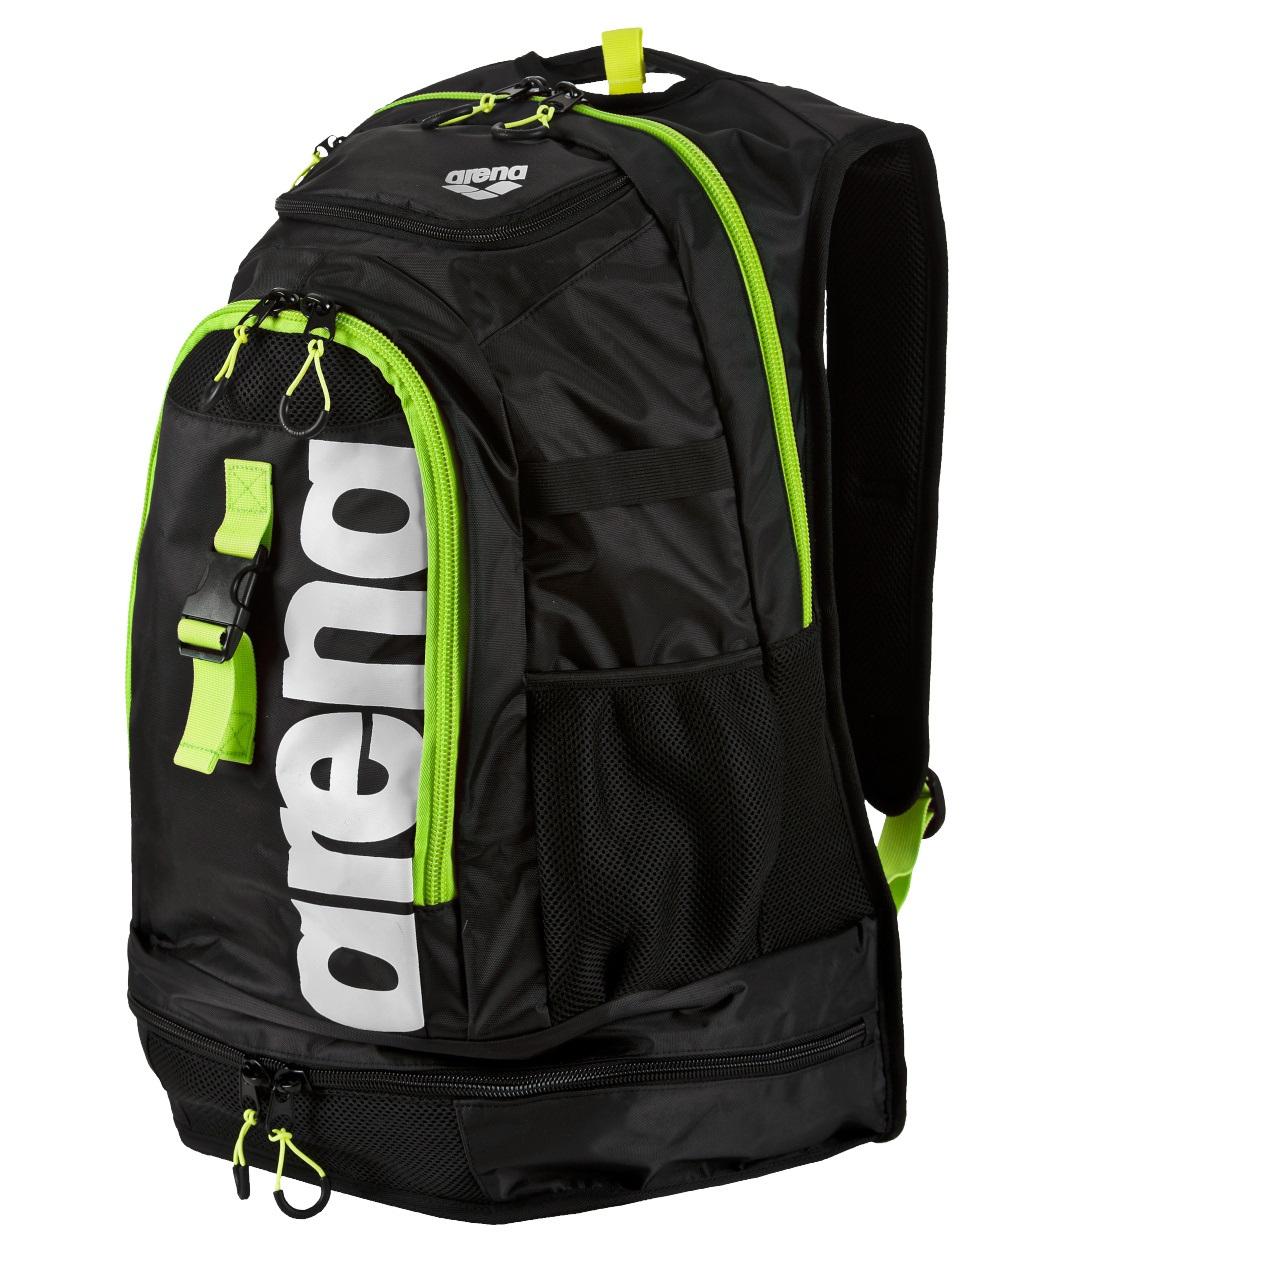 Arena Fastpack 2.1 Backpack Ryggsekk